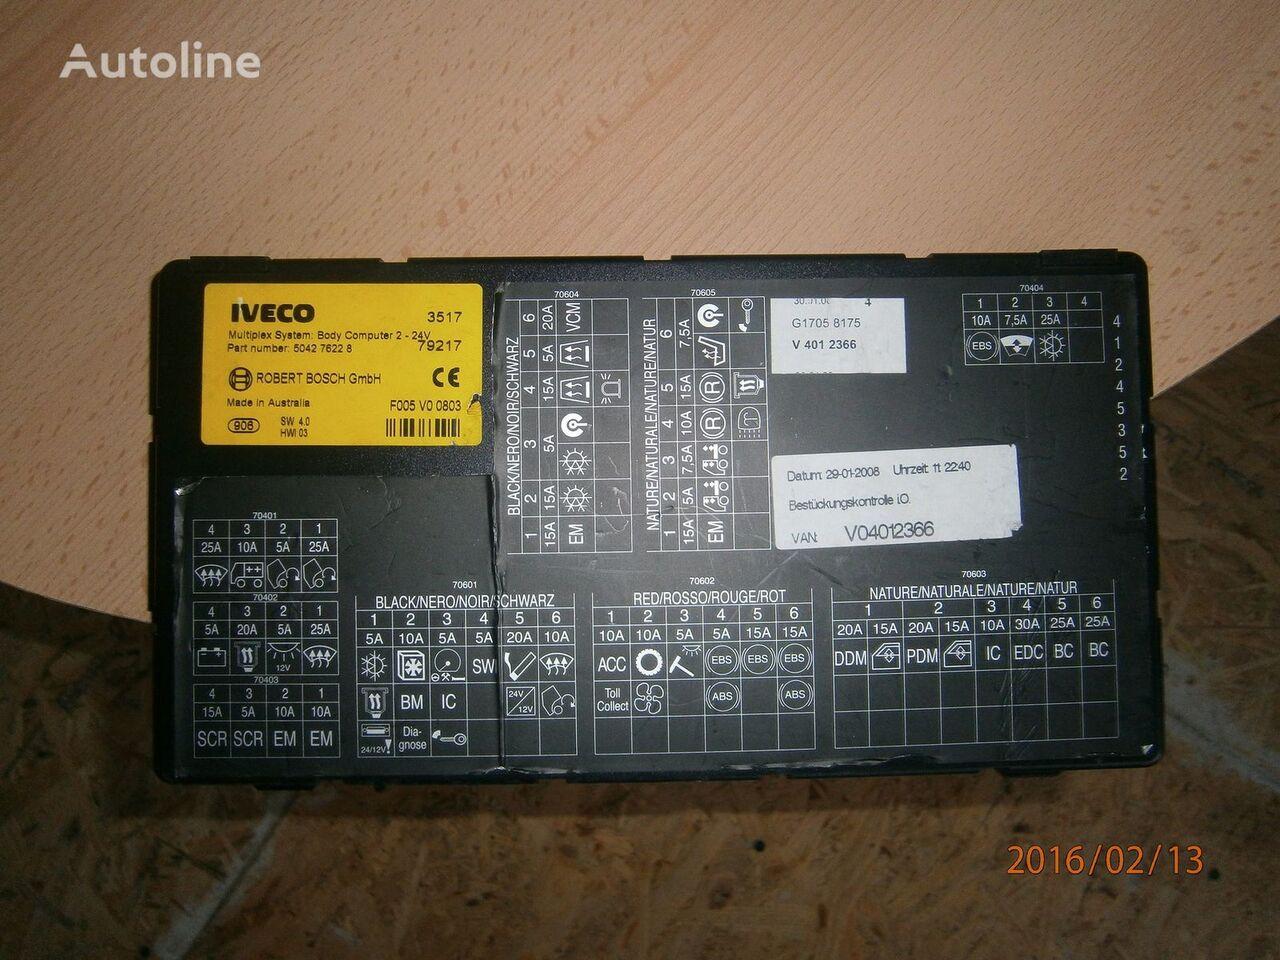 Iveco Stralis EURO5 Multiplex system body computer 504276228 besturingseenheid voor IVECO Stralis trekker